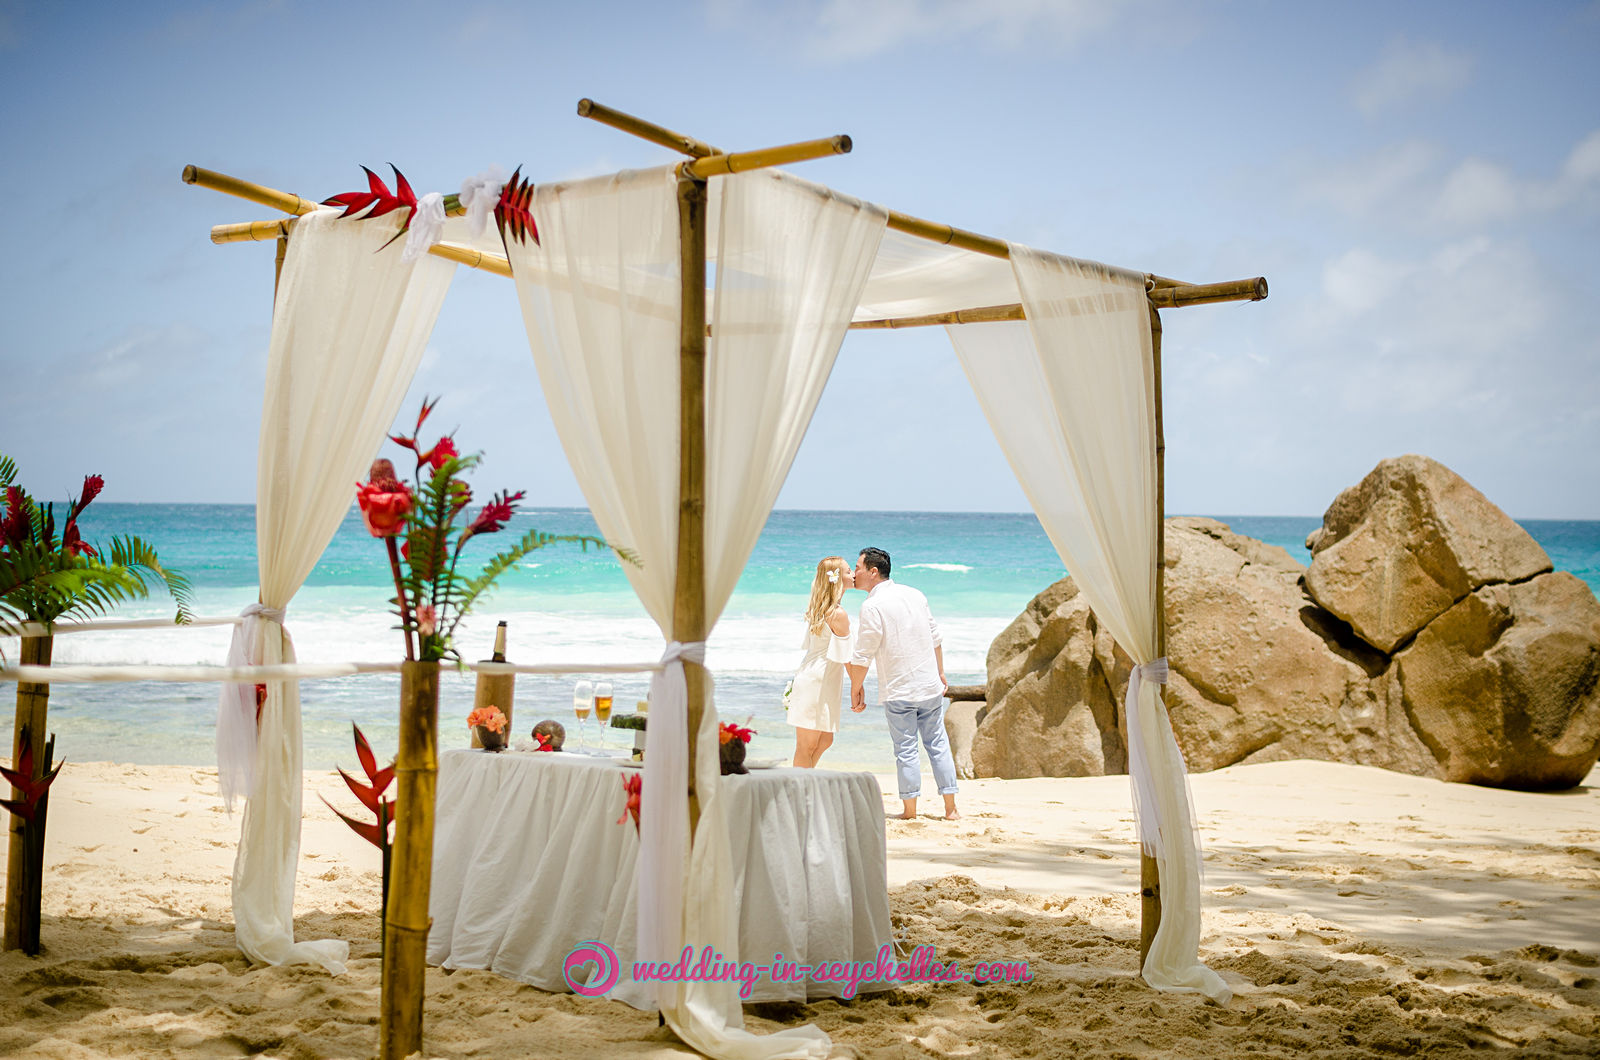 Expatriate Wedding Offers | Weddings in Seychelles